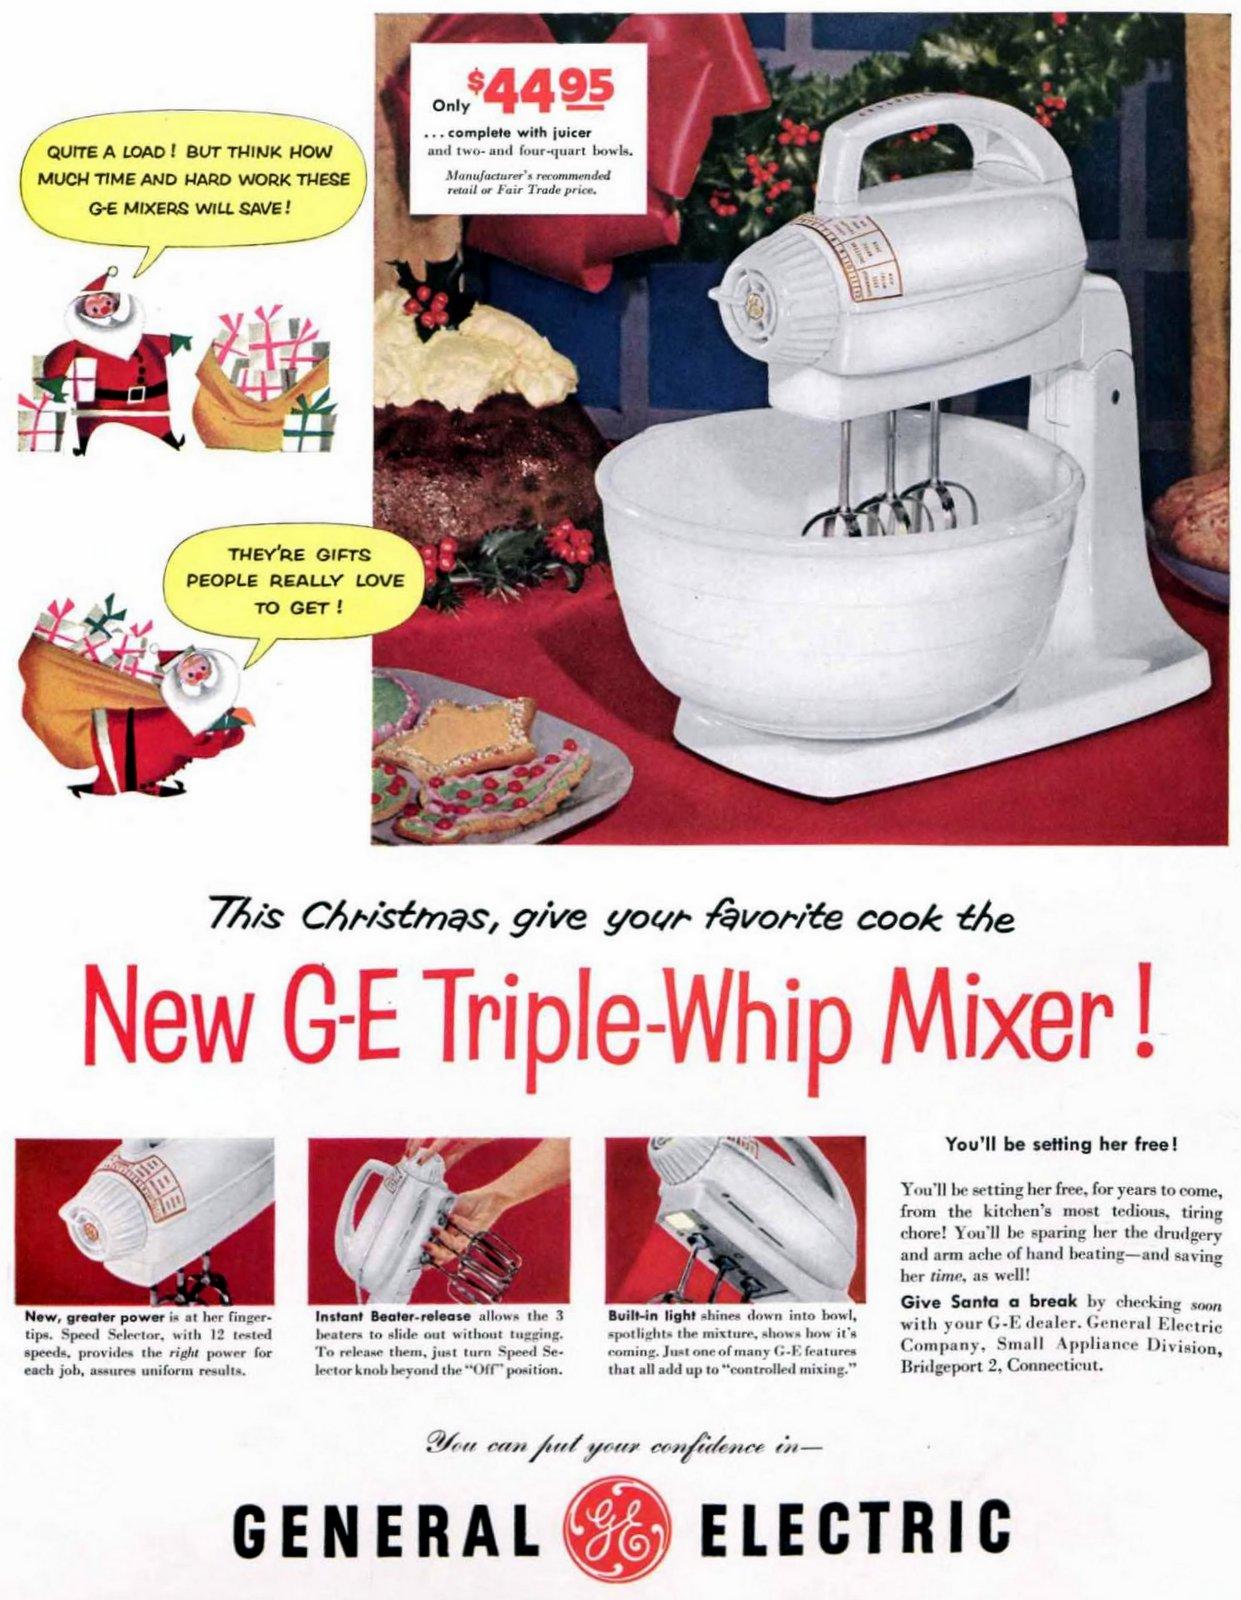 Vintage 1950s GE Triple-Whip Mixer (1953)